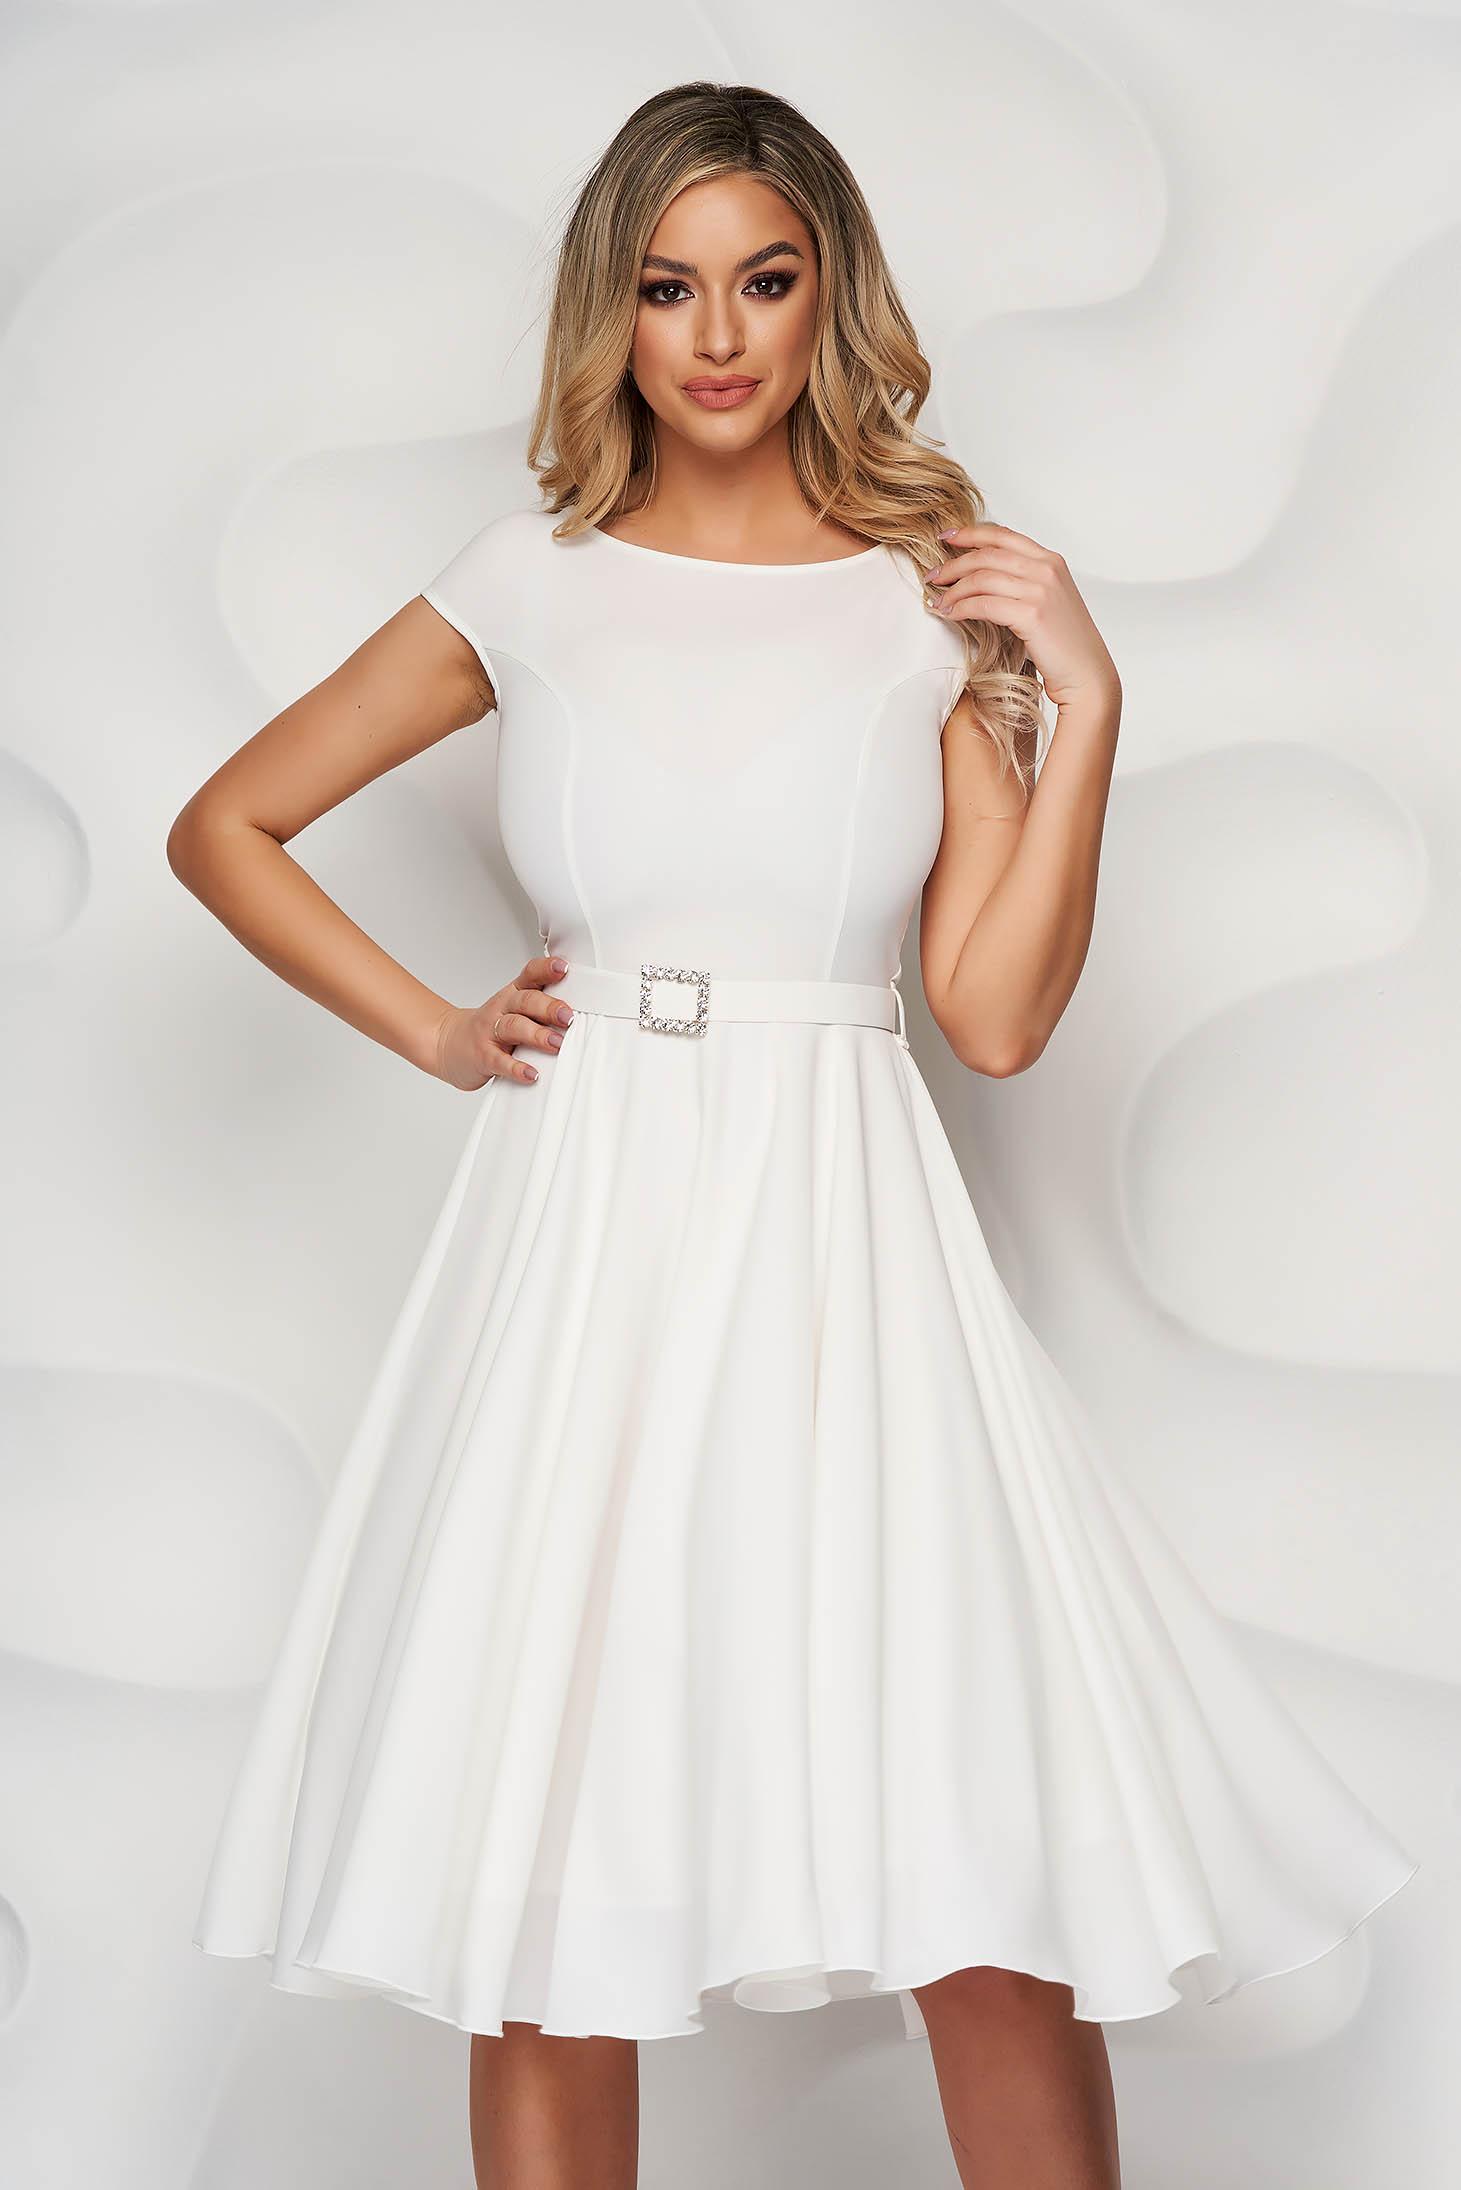 StarShinerS white dress elegant midi cloth accessorized with a waistband